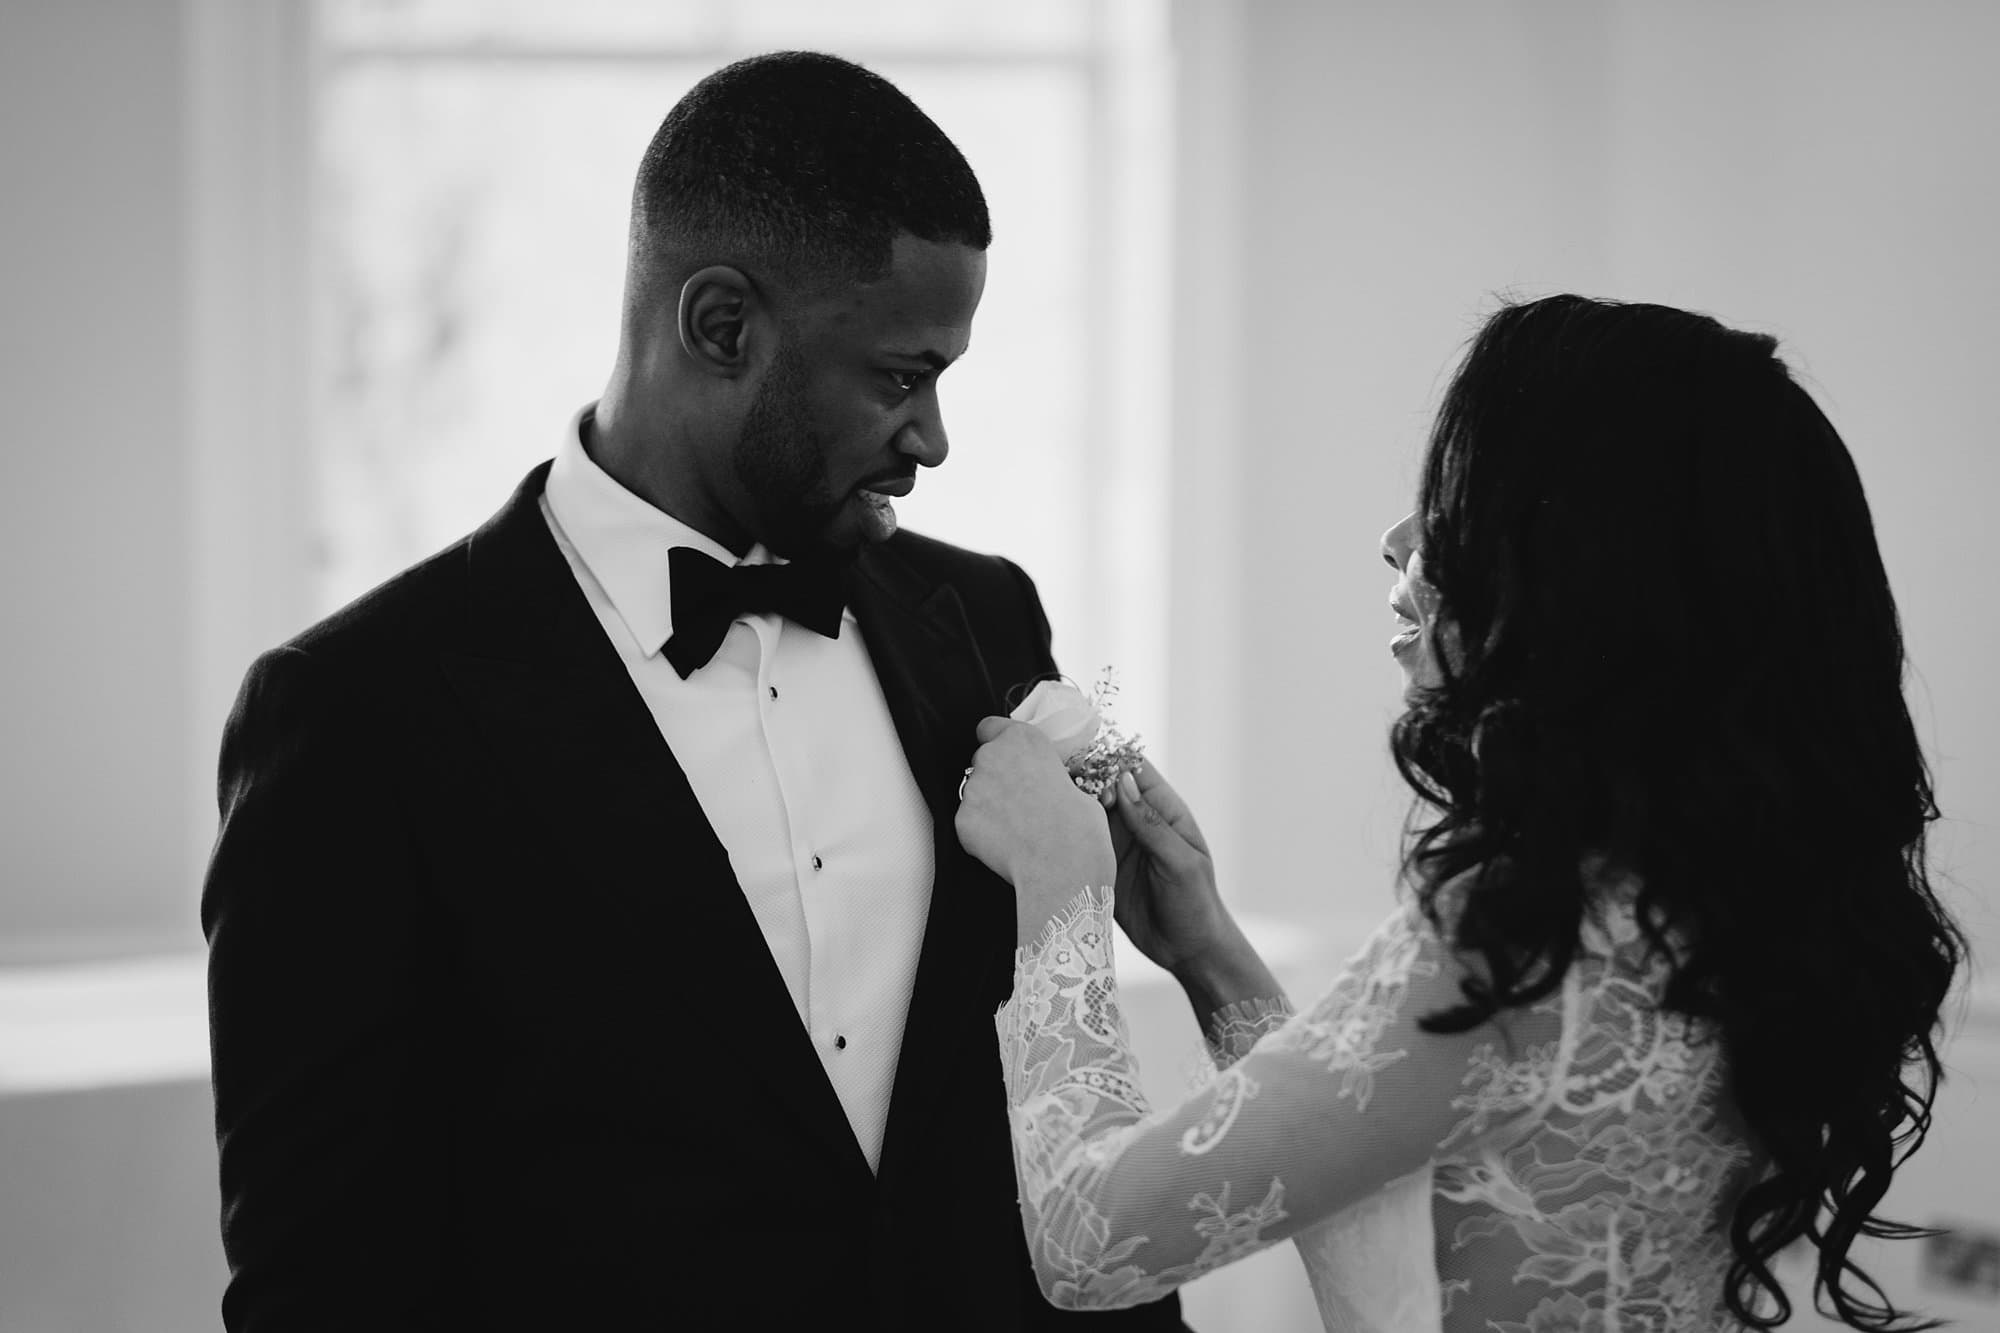 asia house london wedding photographer 005 - Rachel + Gabriel   Asia House Wedding Photography